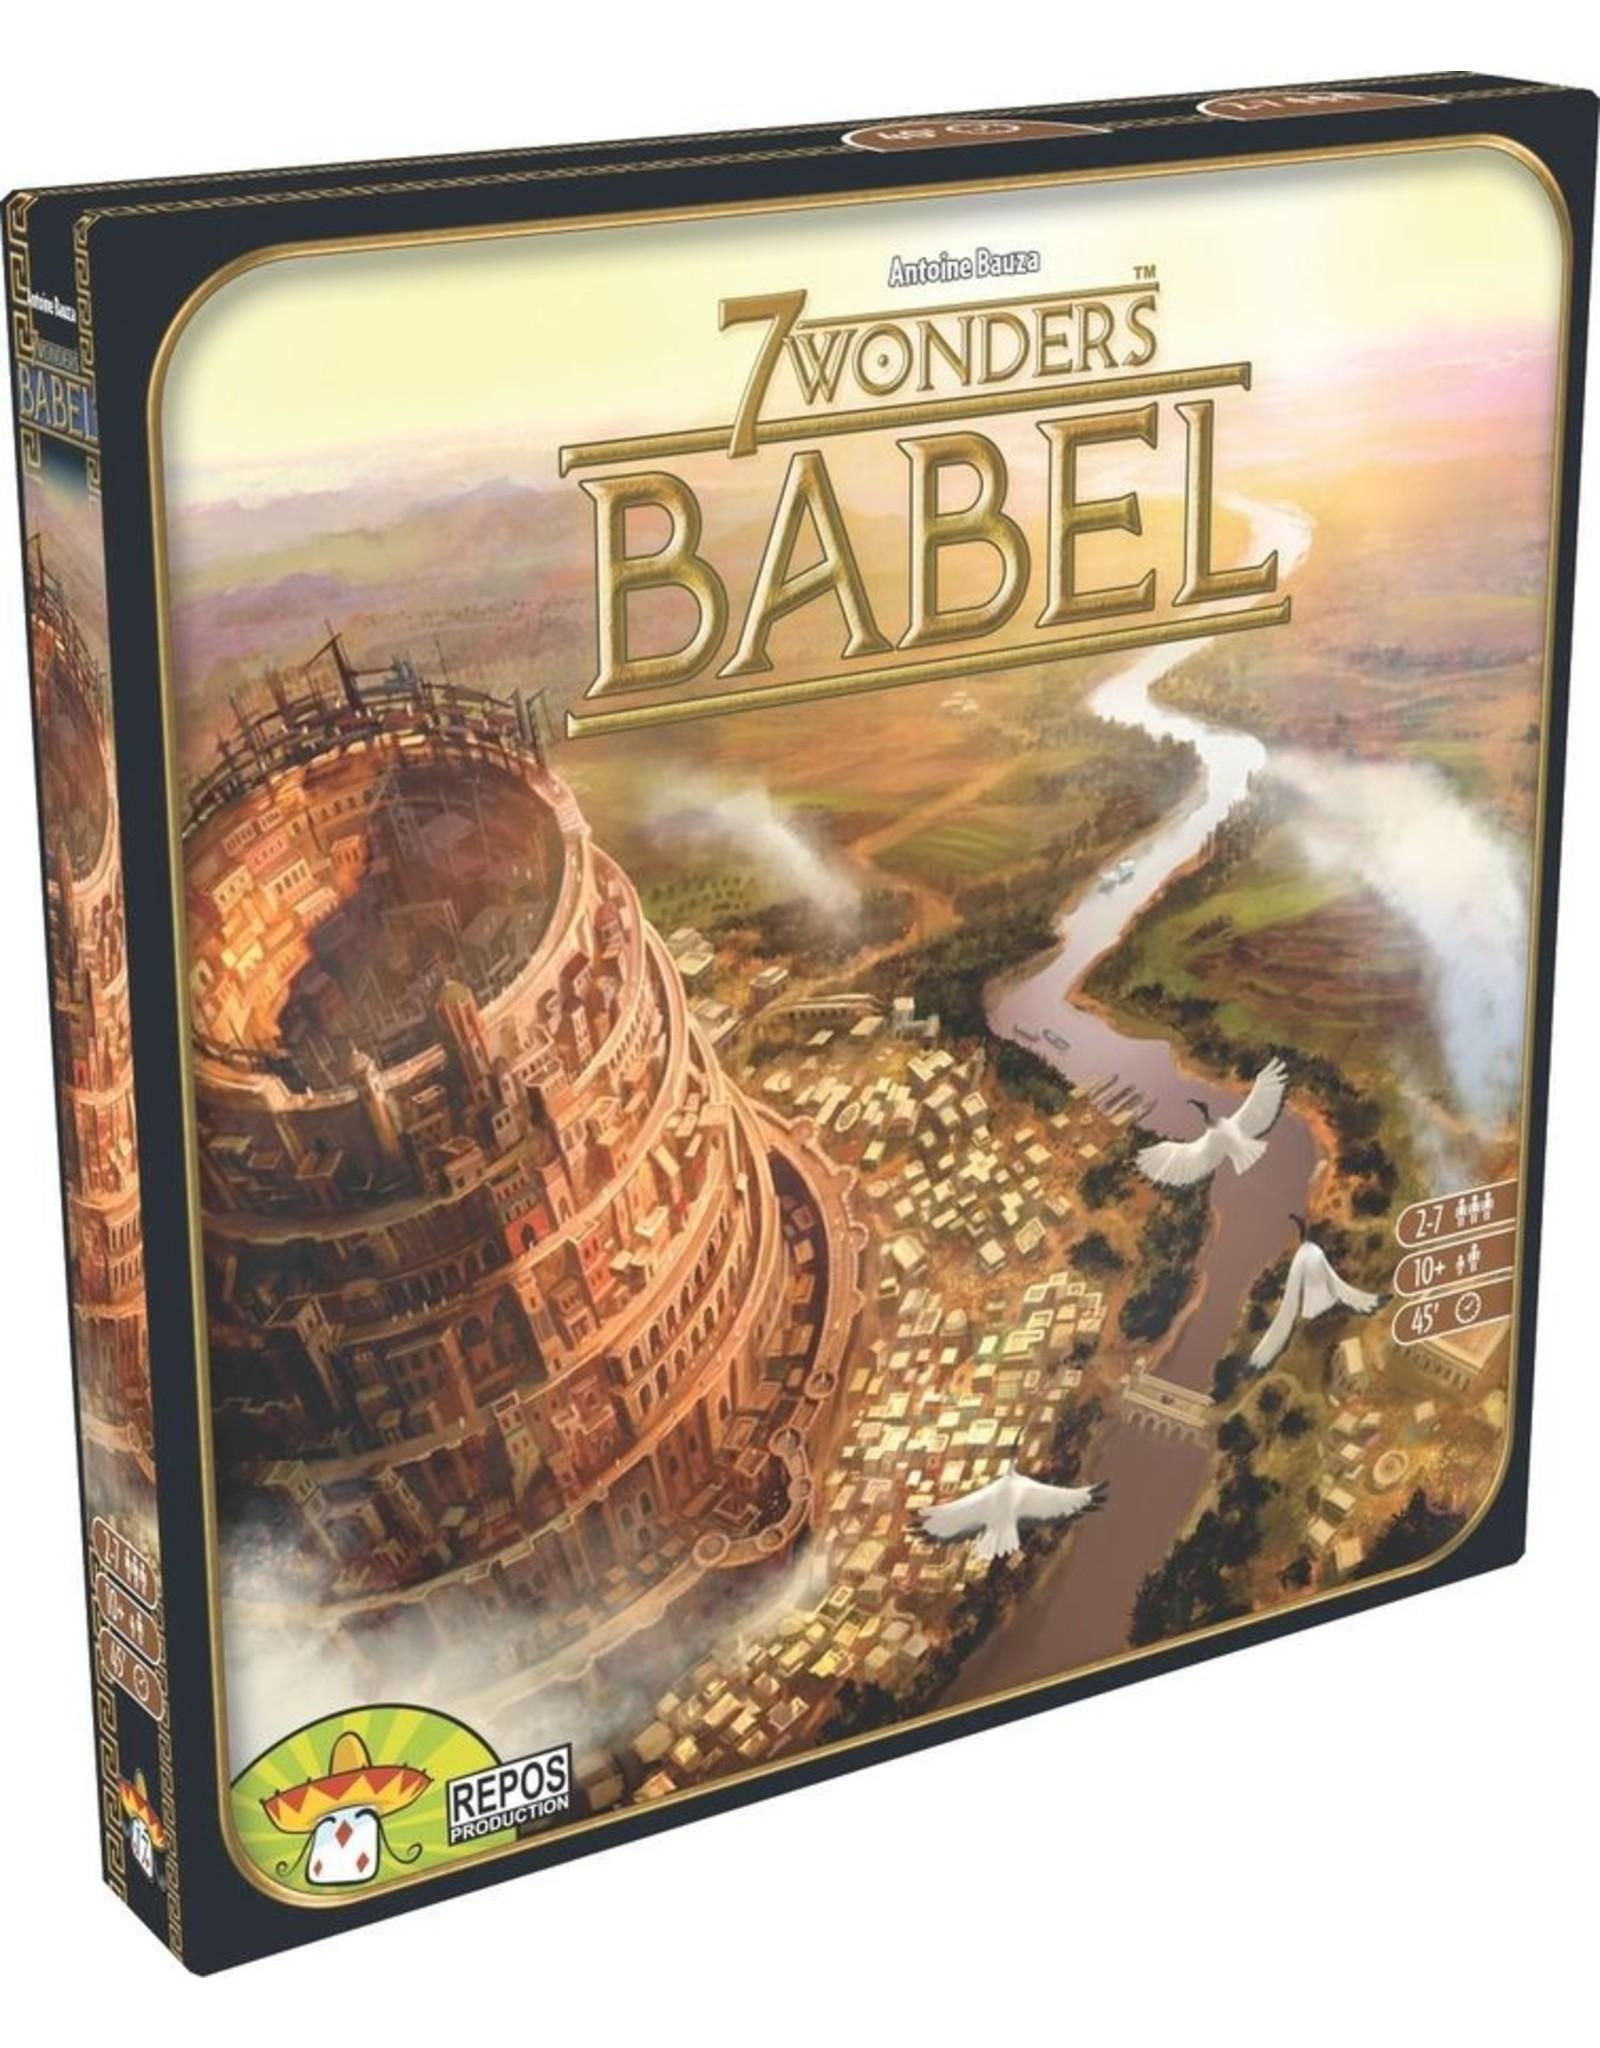 Repos 7 Wonders 1E: Babel Expansion